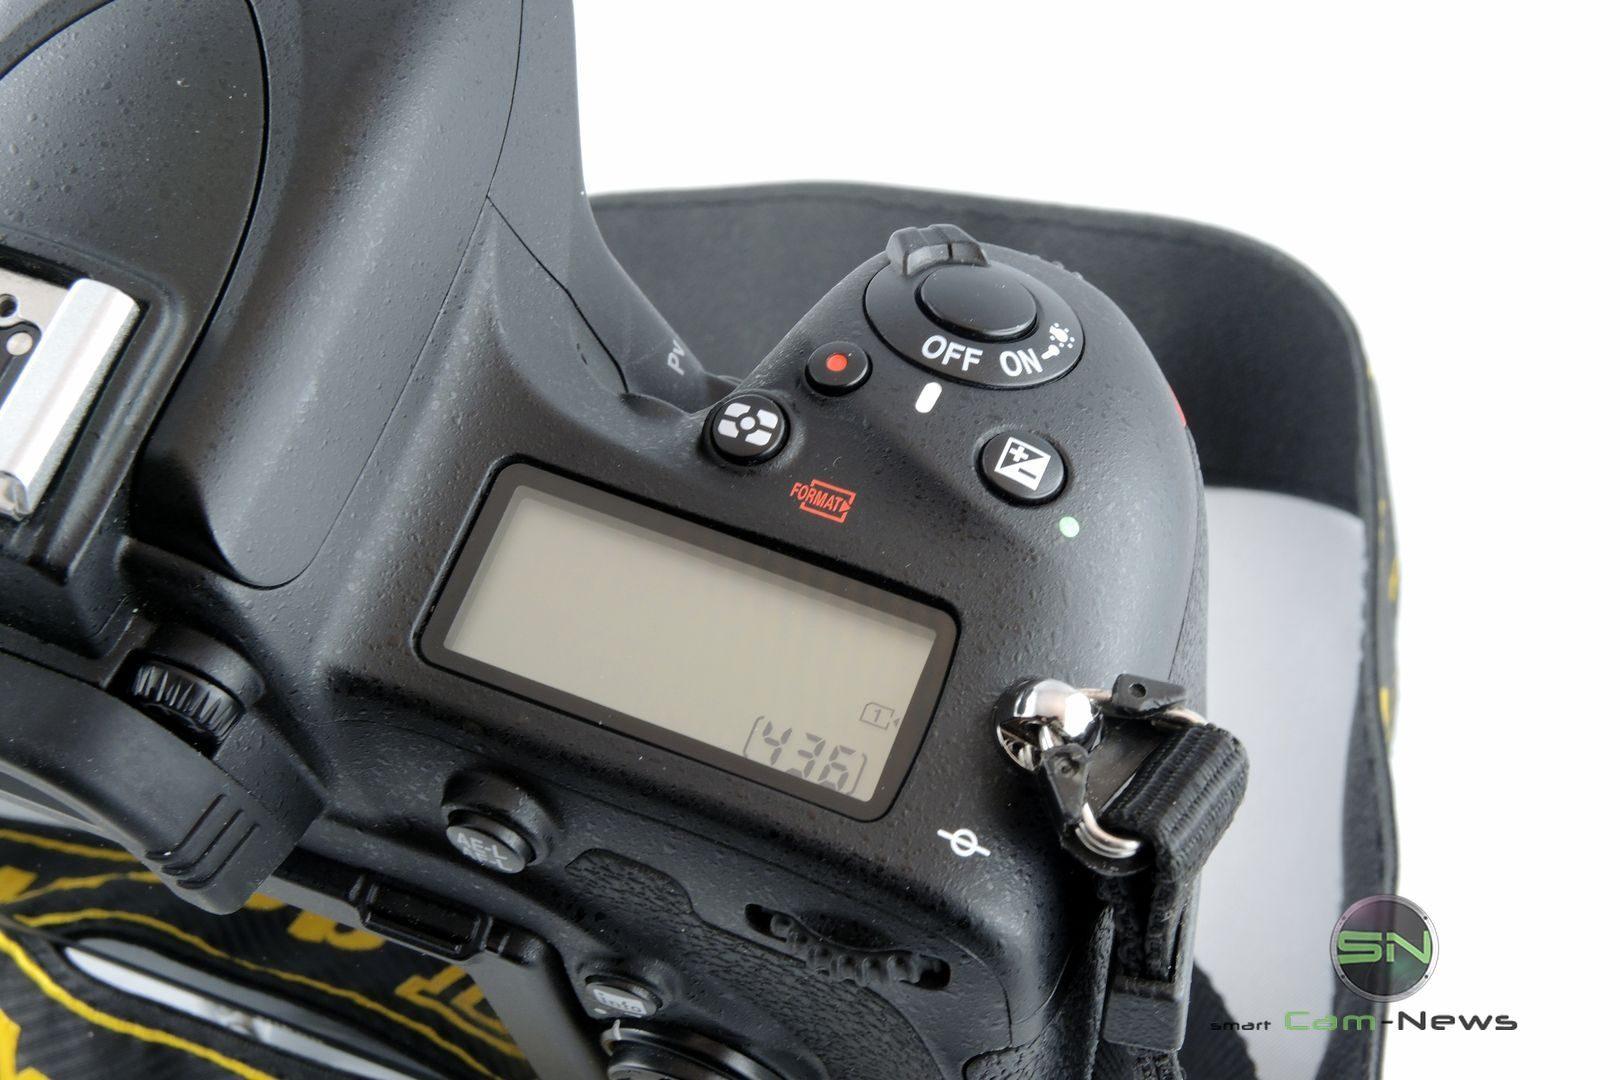 Kontrolldisplay - Nikon D750 - SmartCamNews